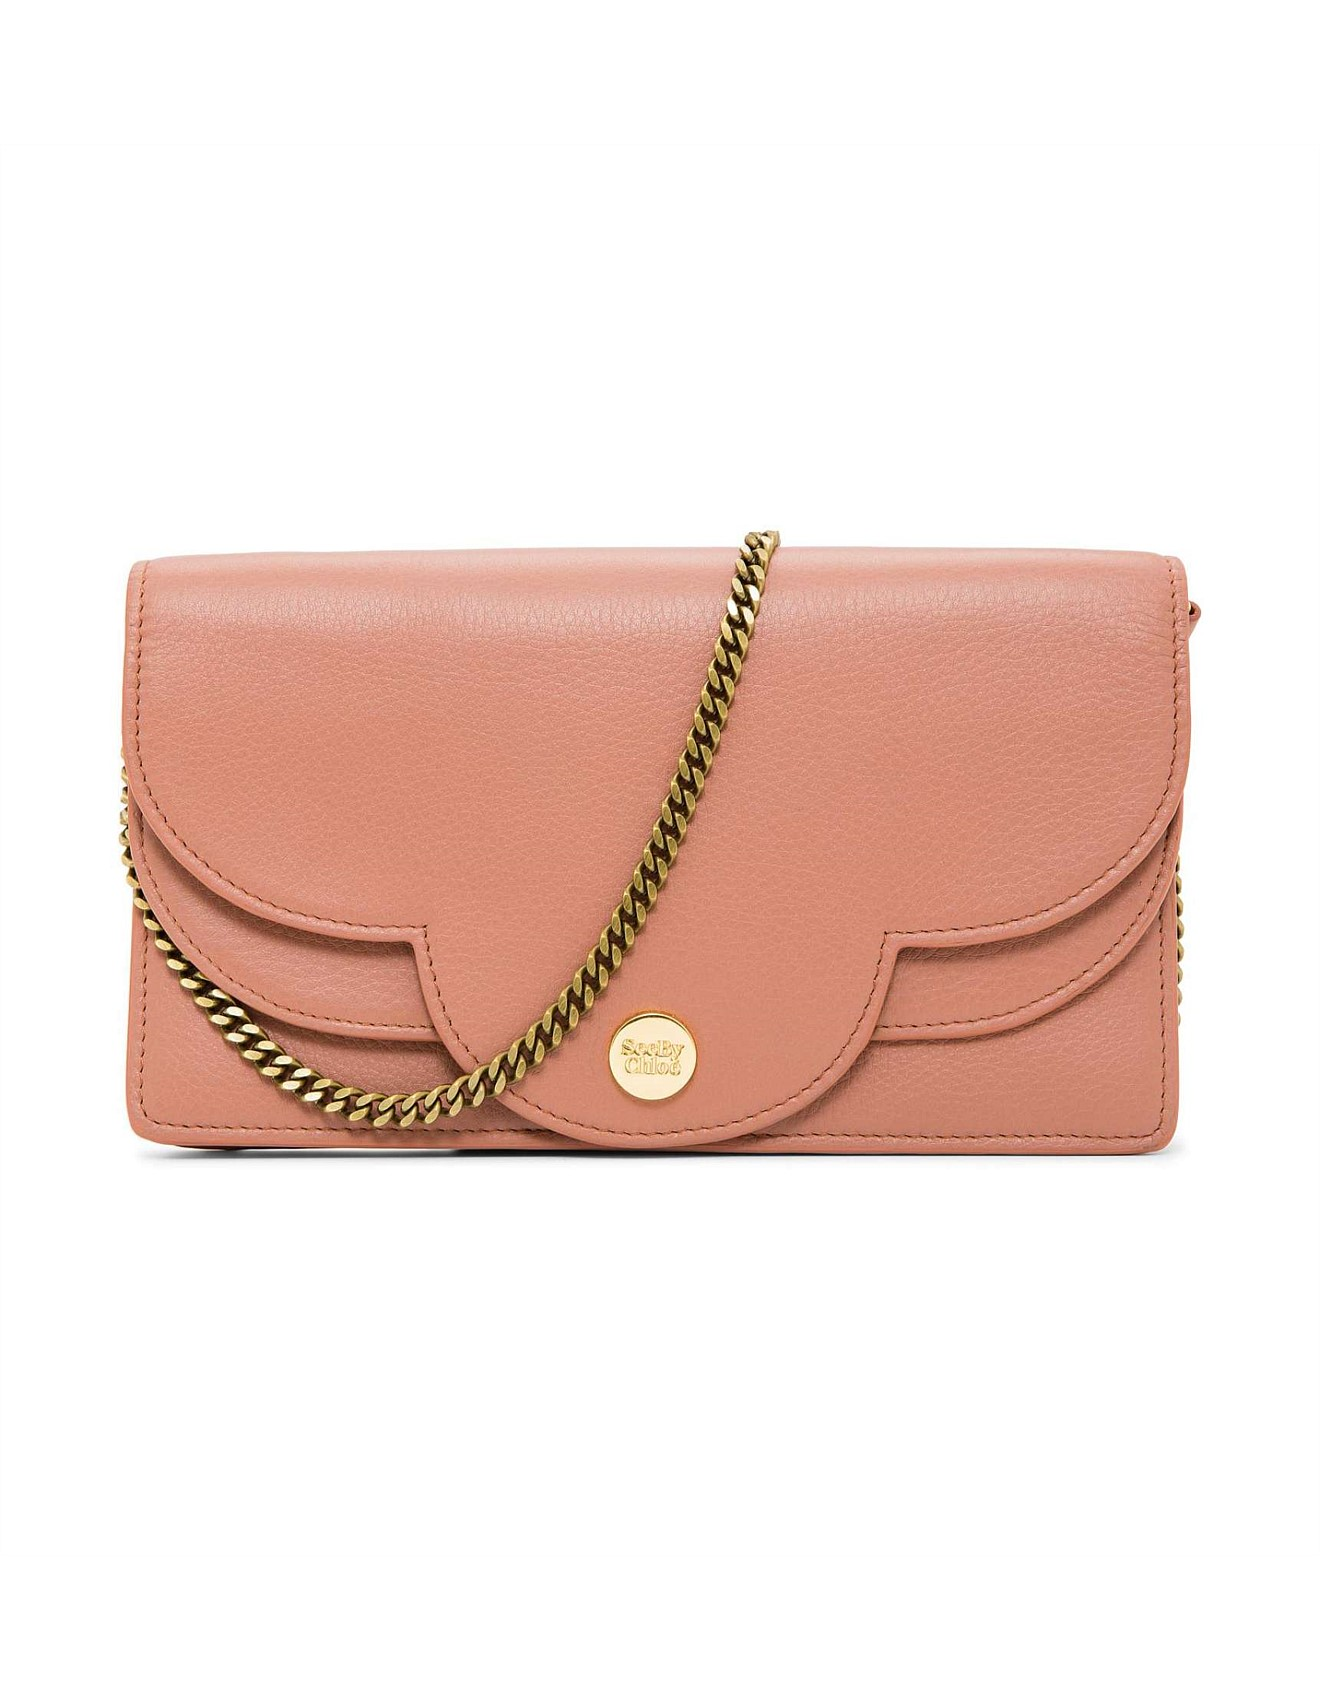 66b6b40d4e Polina Scallop Evening Bag